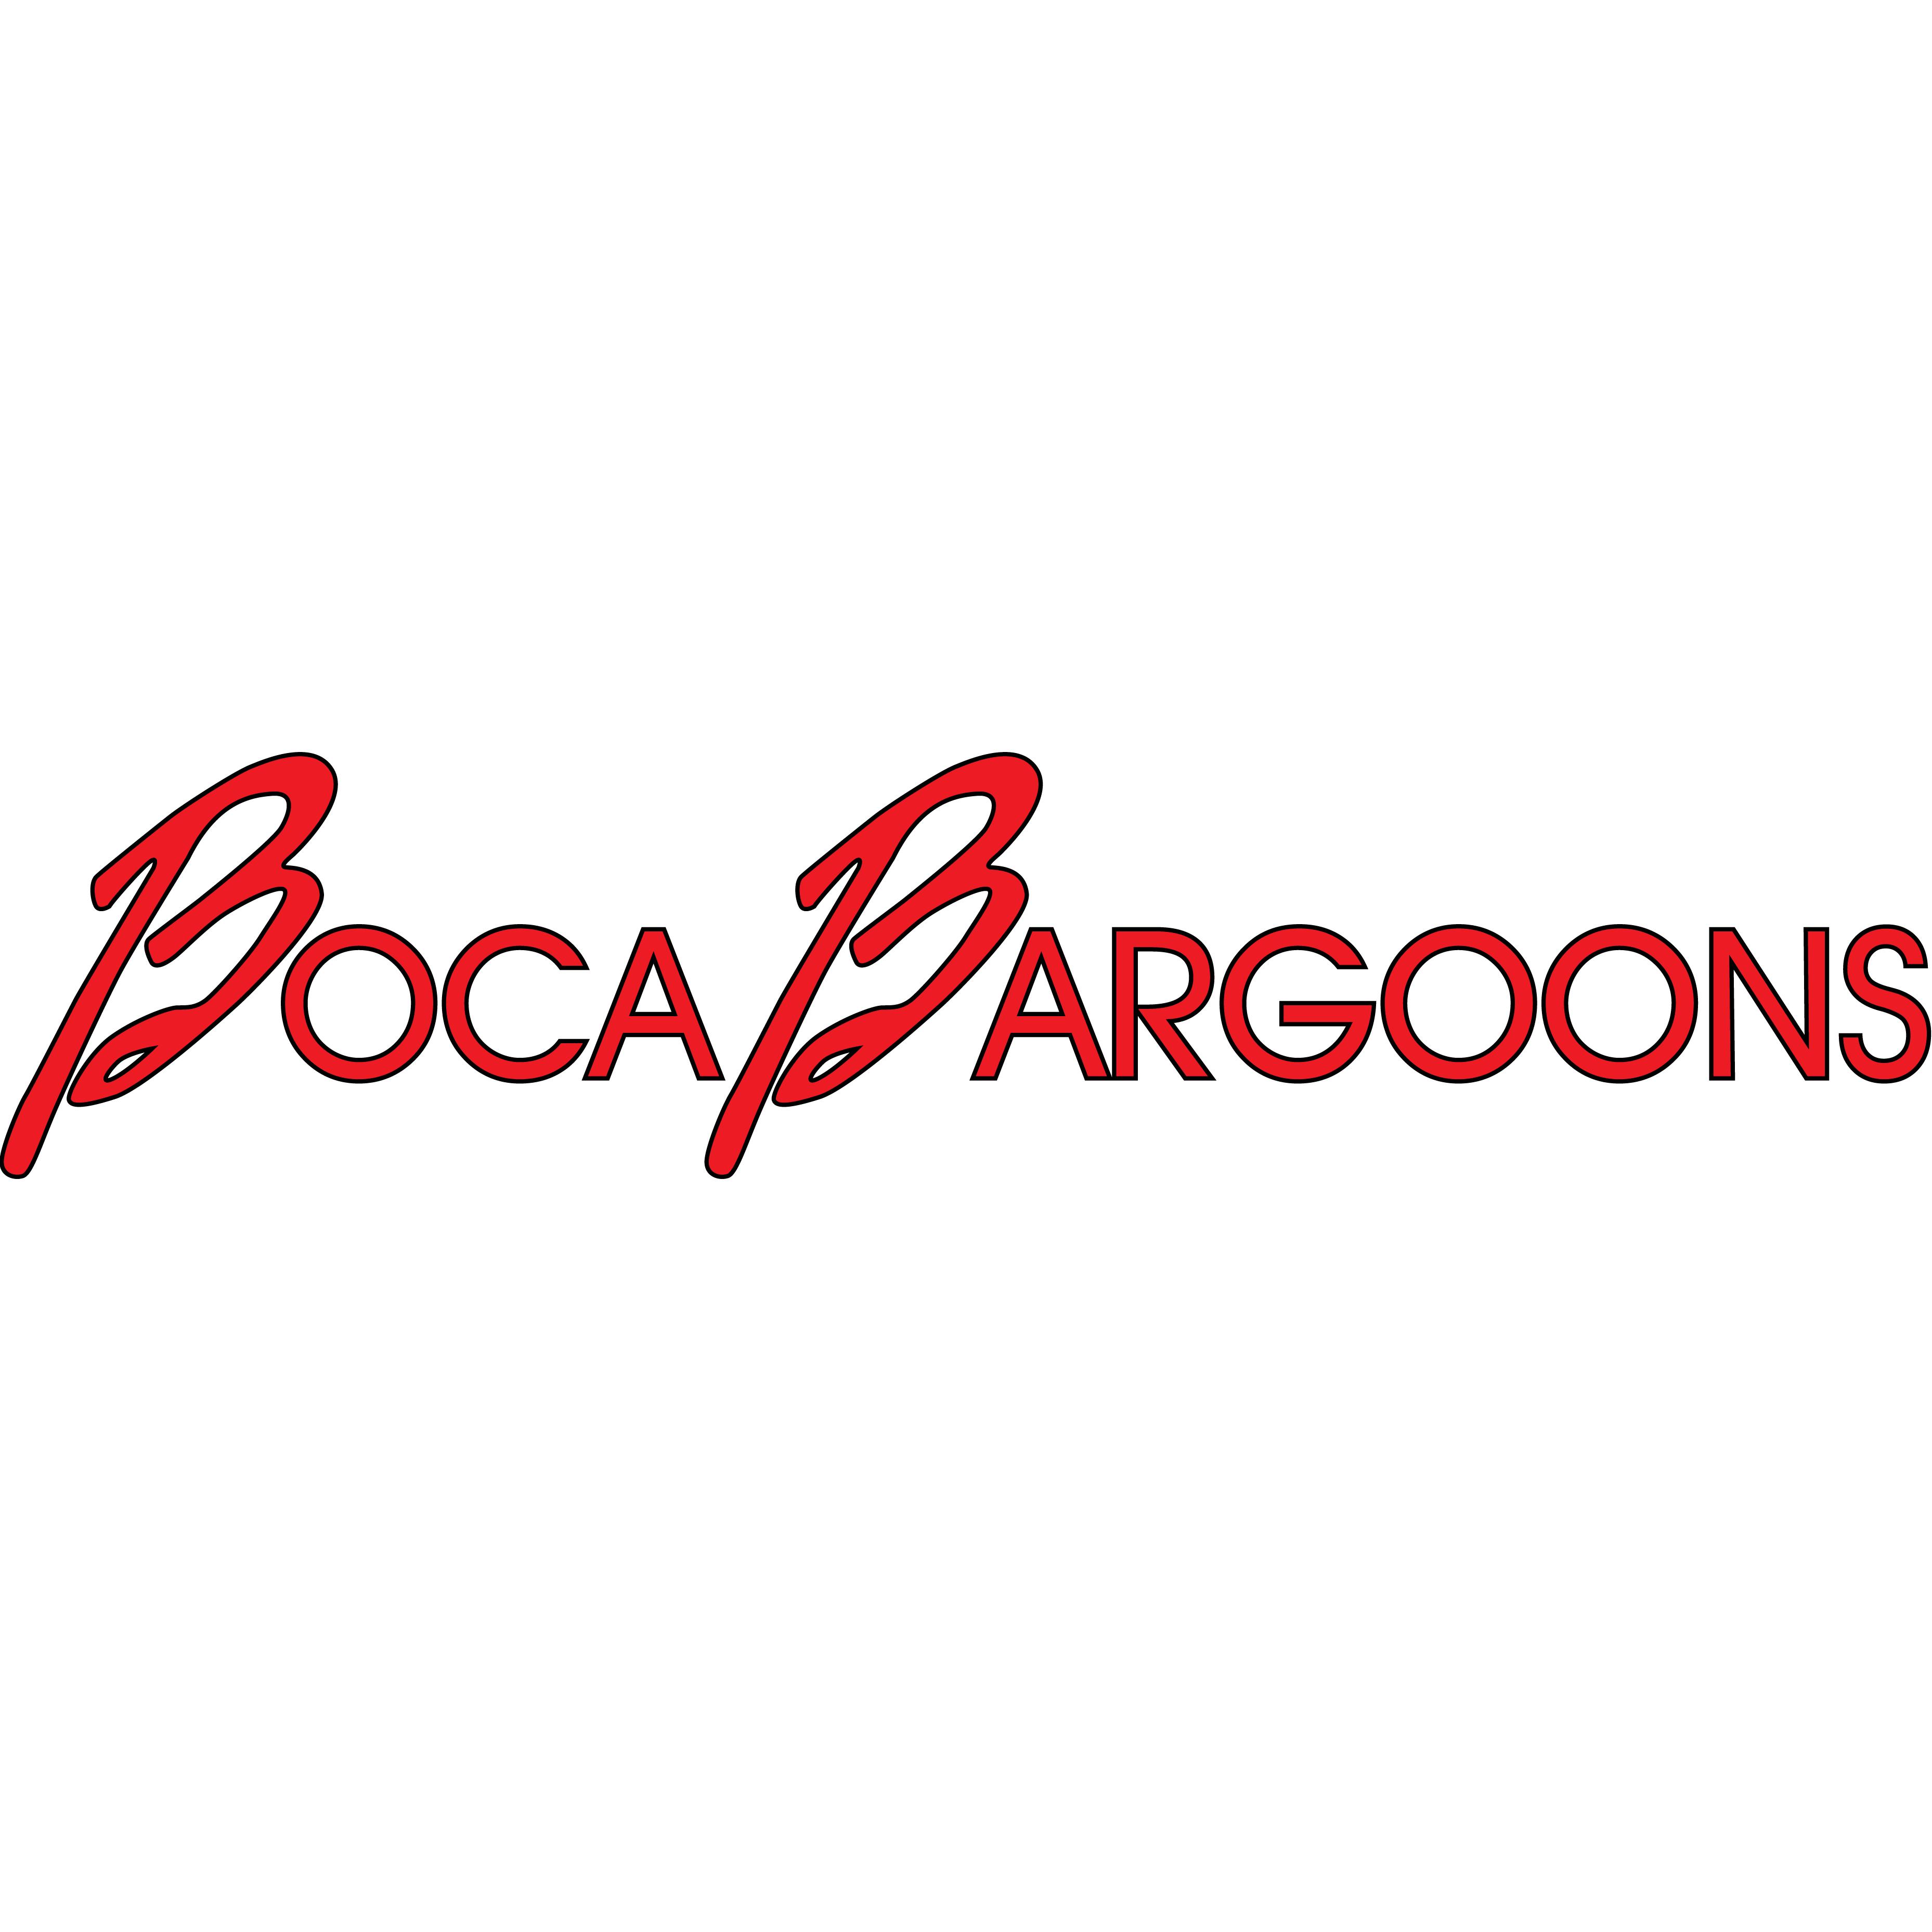 Boca Bargoons Lake Park - Lake Park, FL 33403 - (561)842-7444 | ShowMeLocal.com